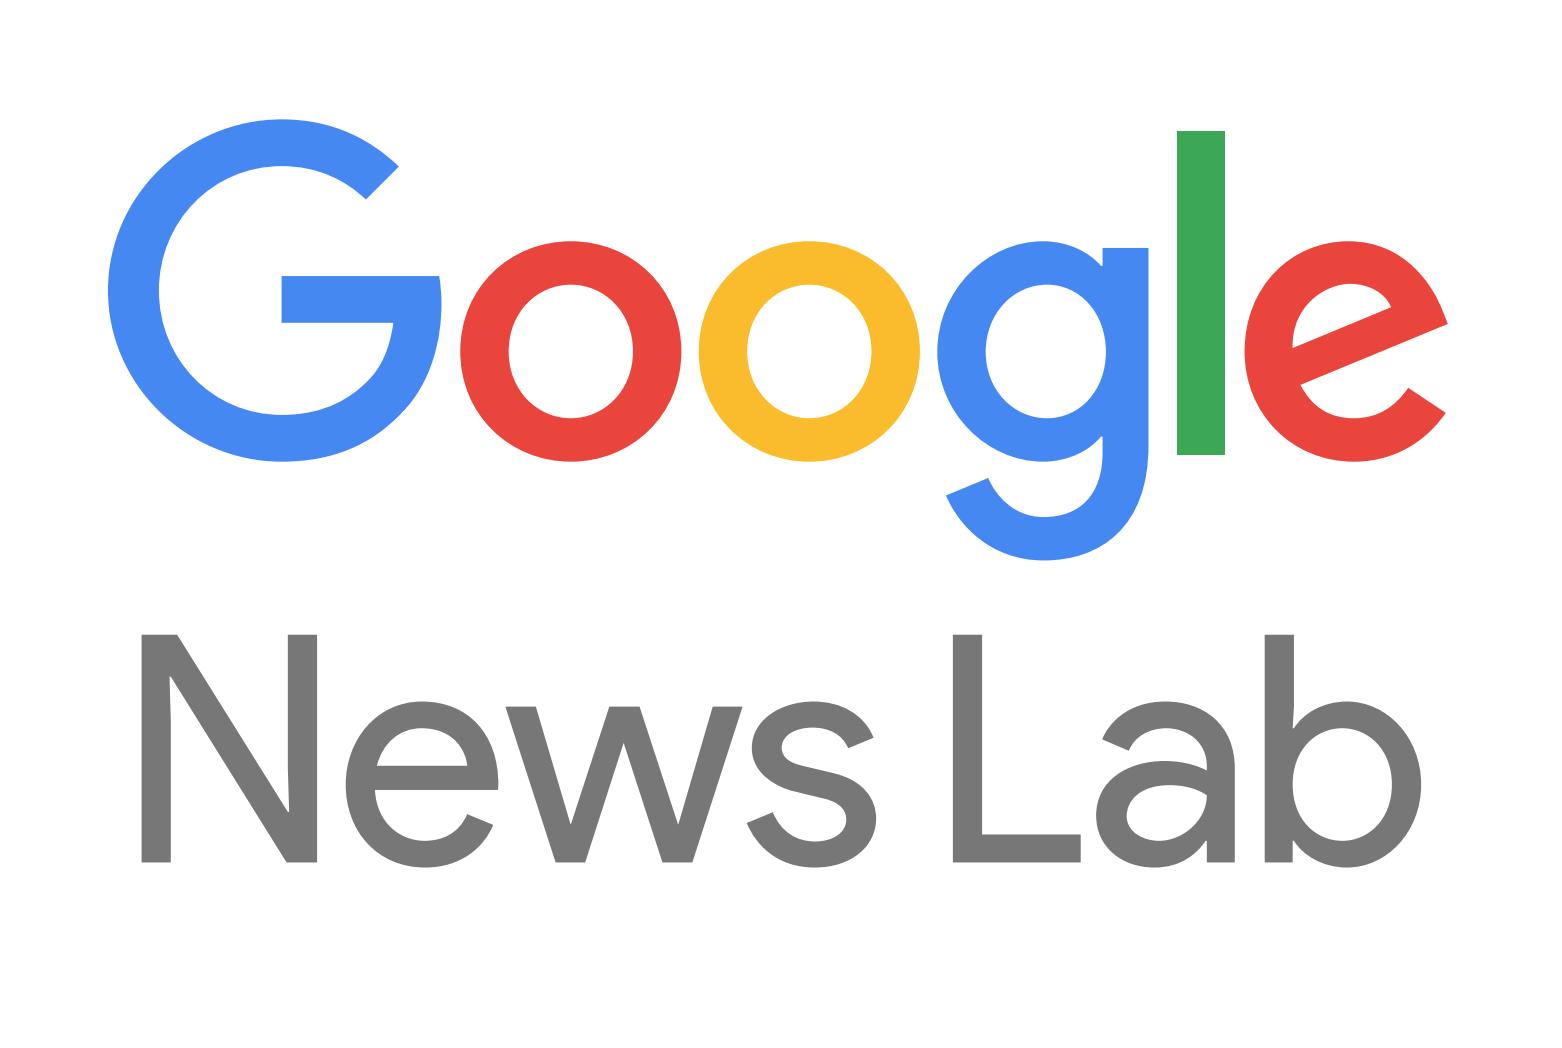 googlenewslab.png